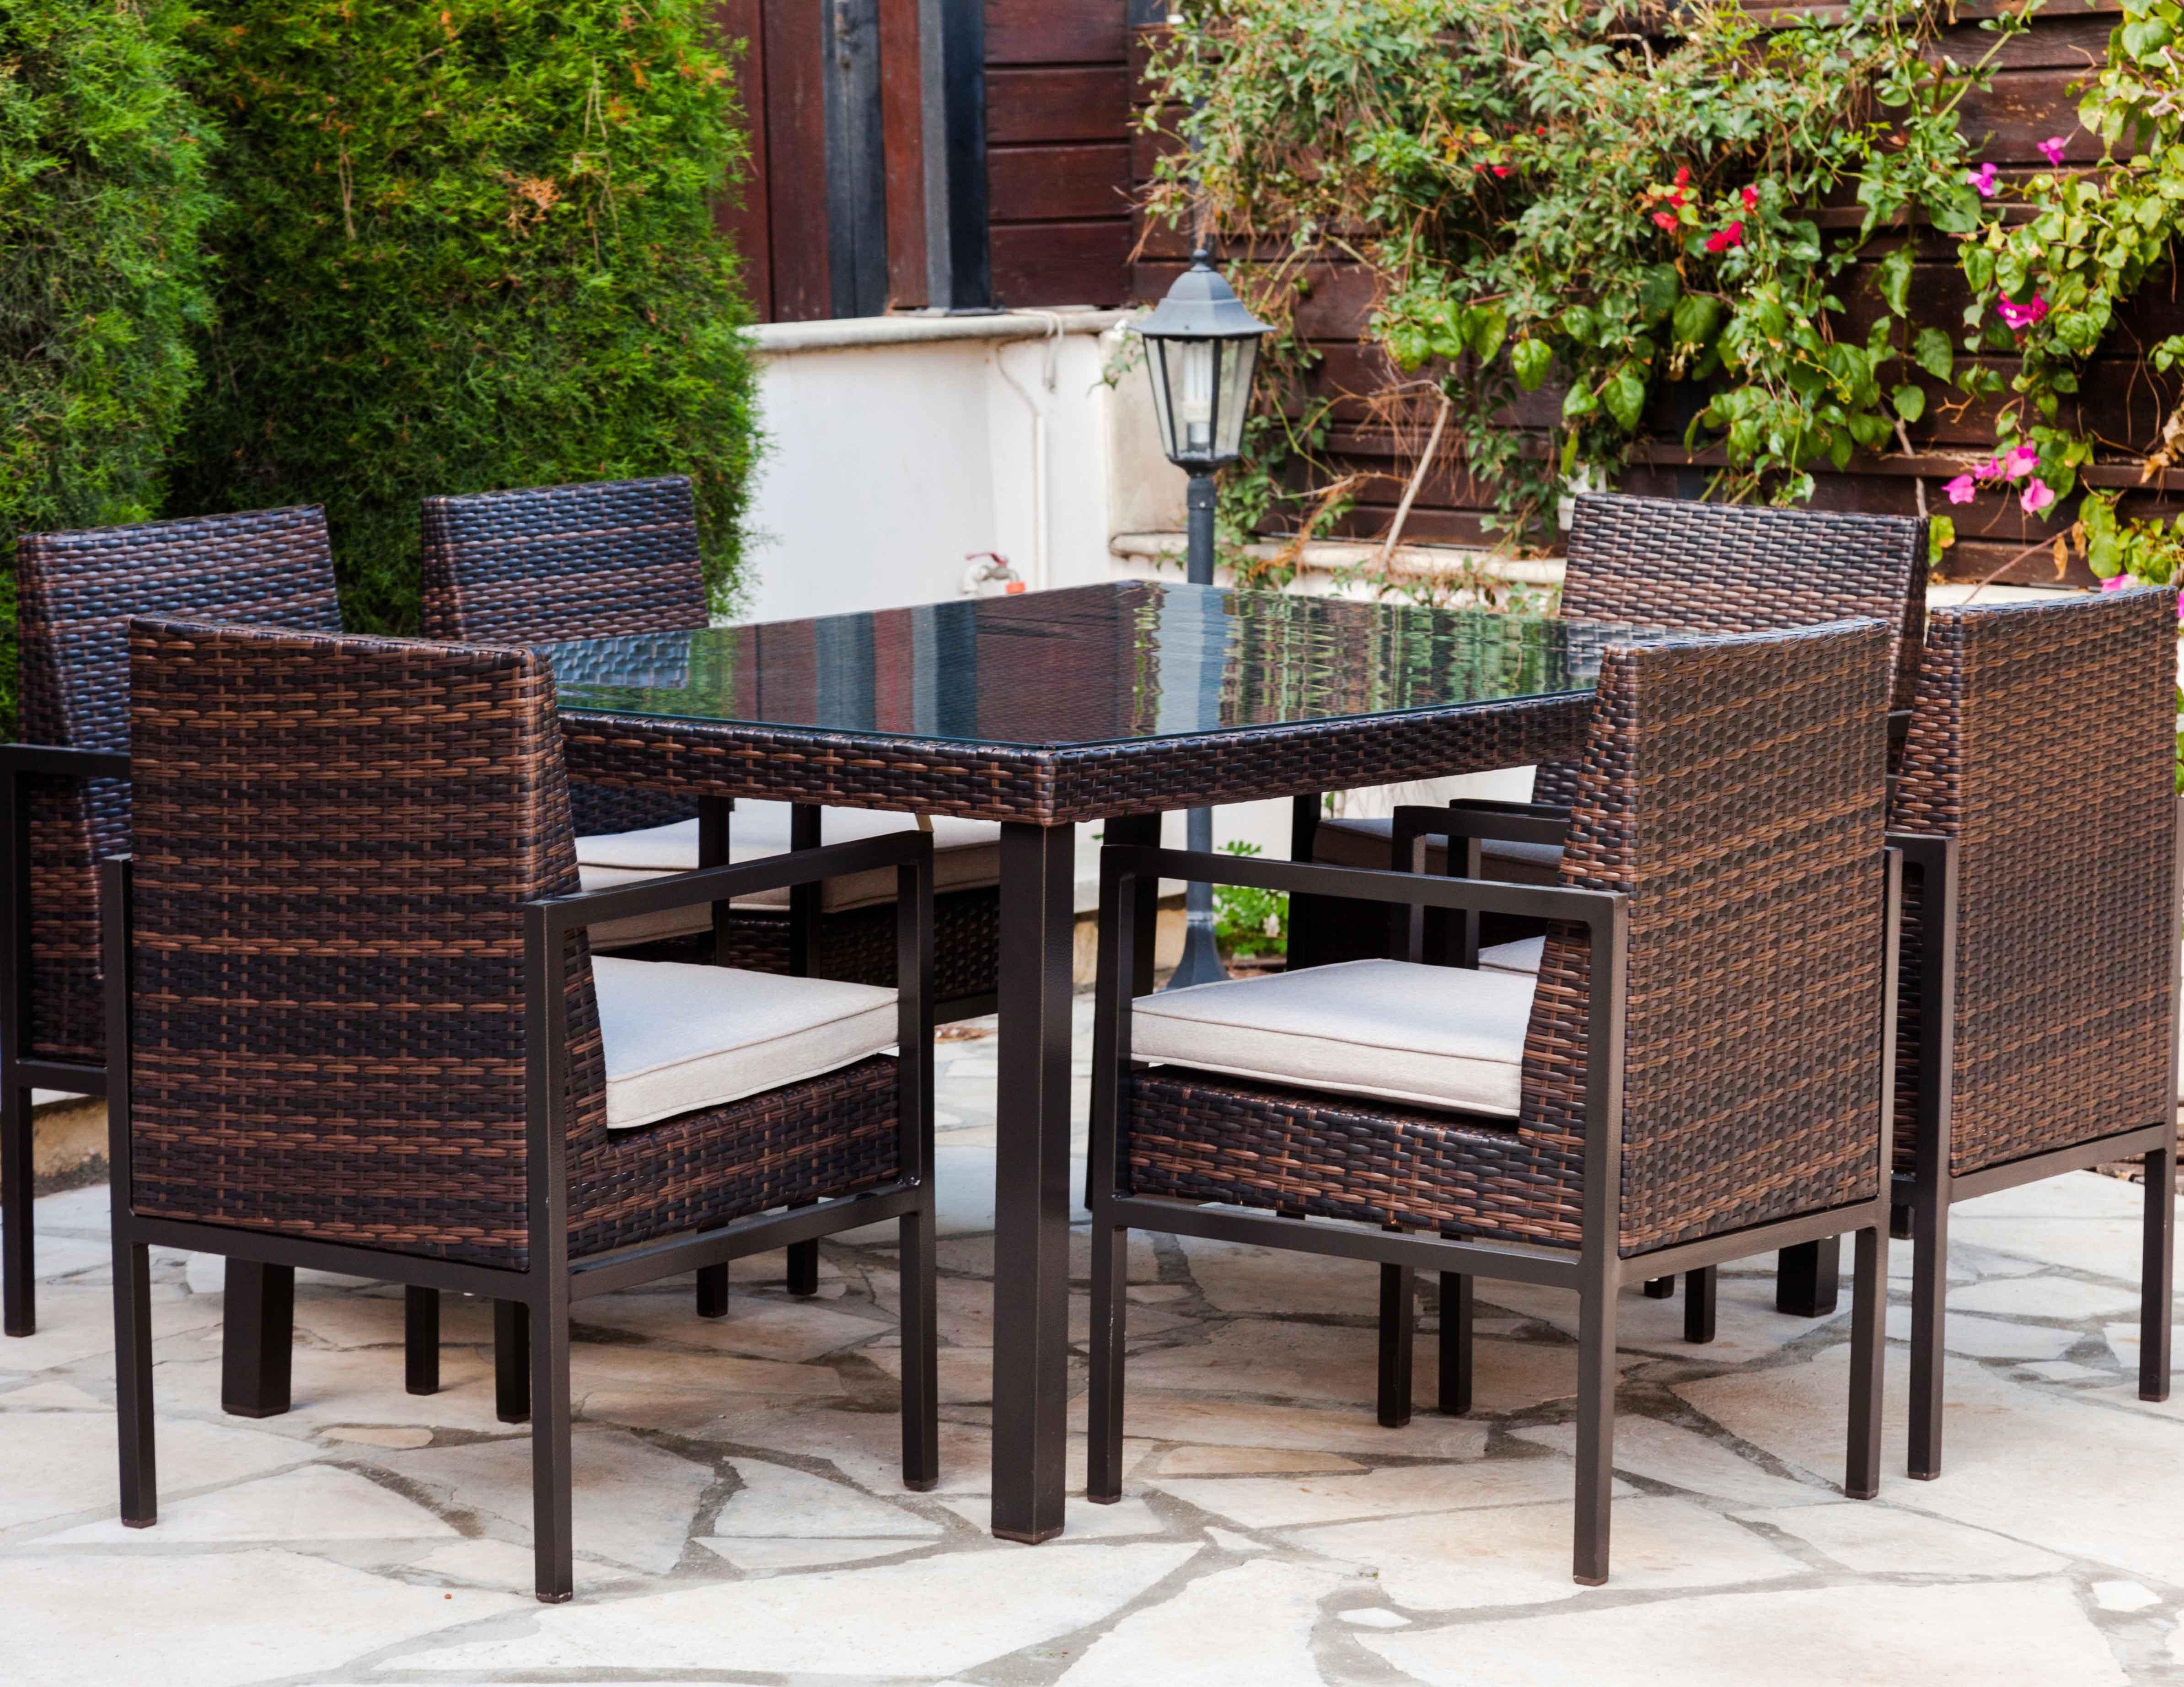 Sydney dining set table chairs garden furniture simosviolaris